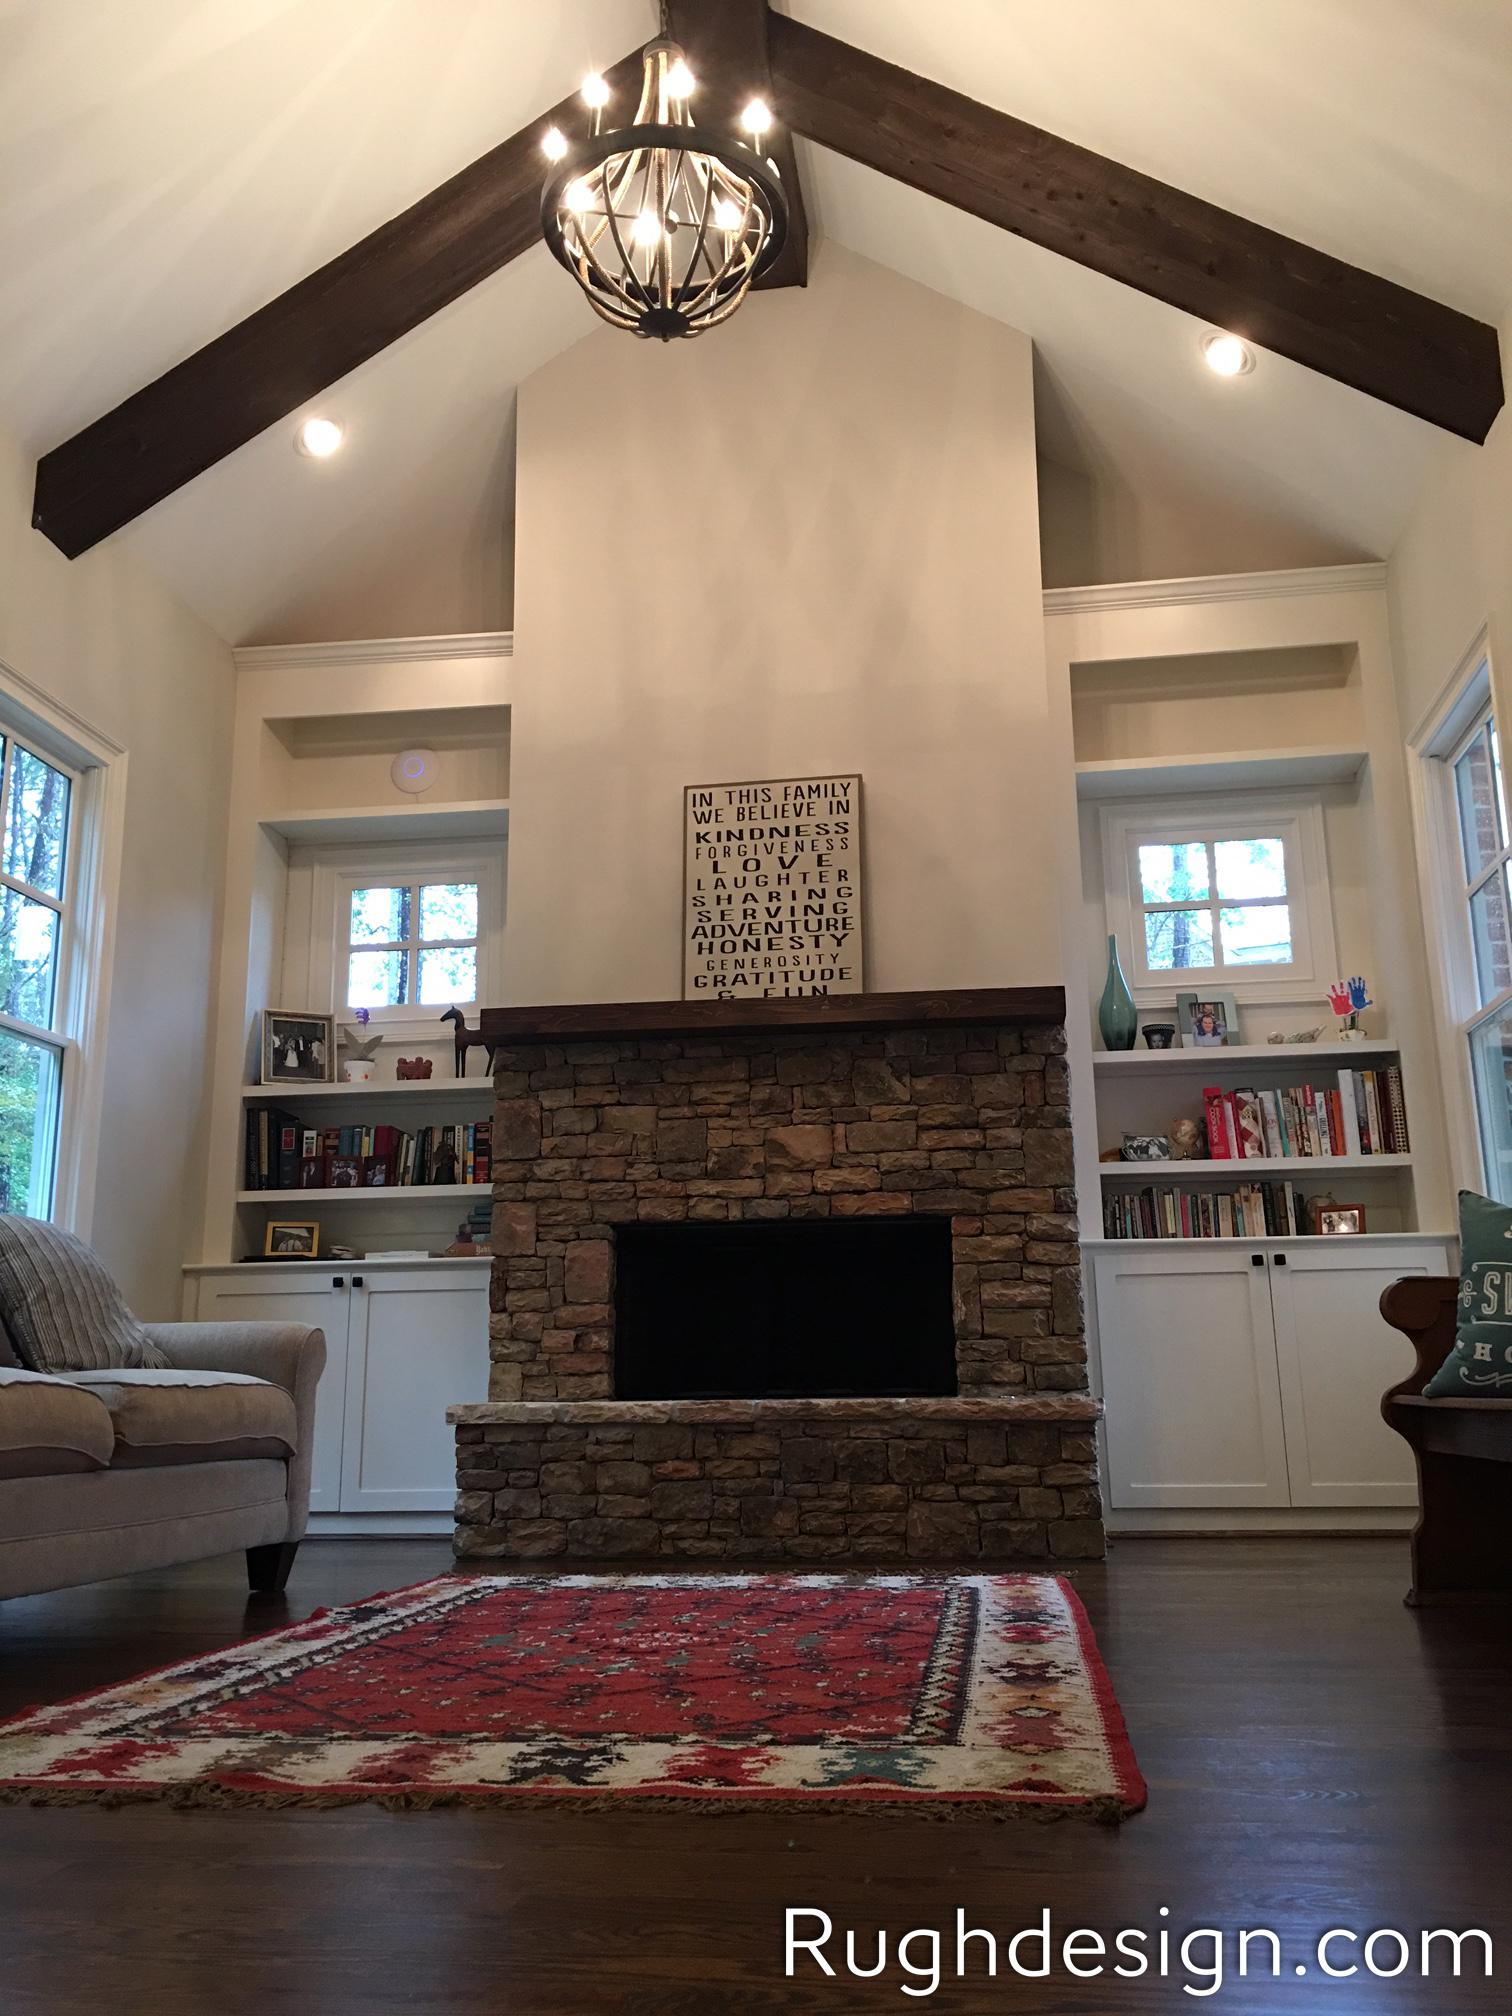 Agreeable Gray SW 7029 in living room wm - Portfolio